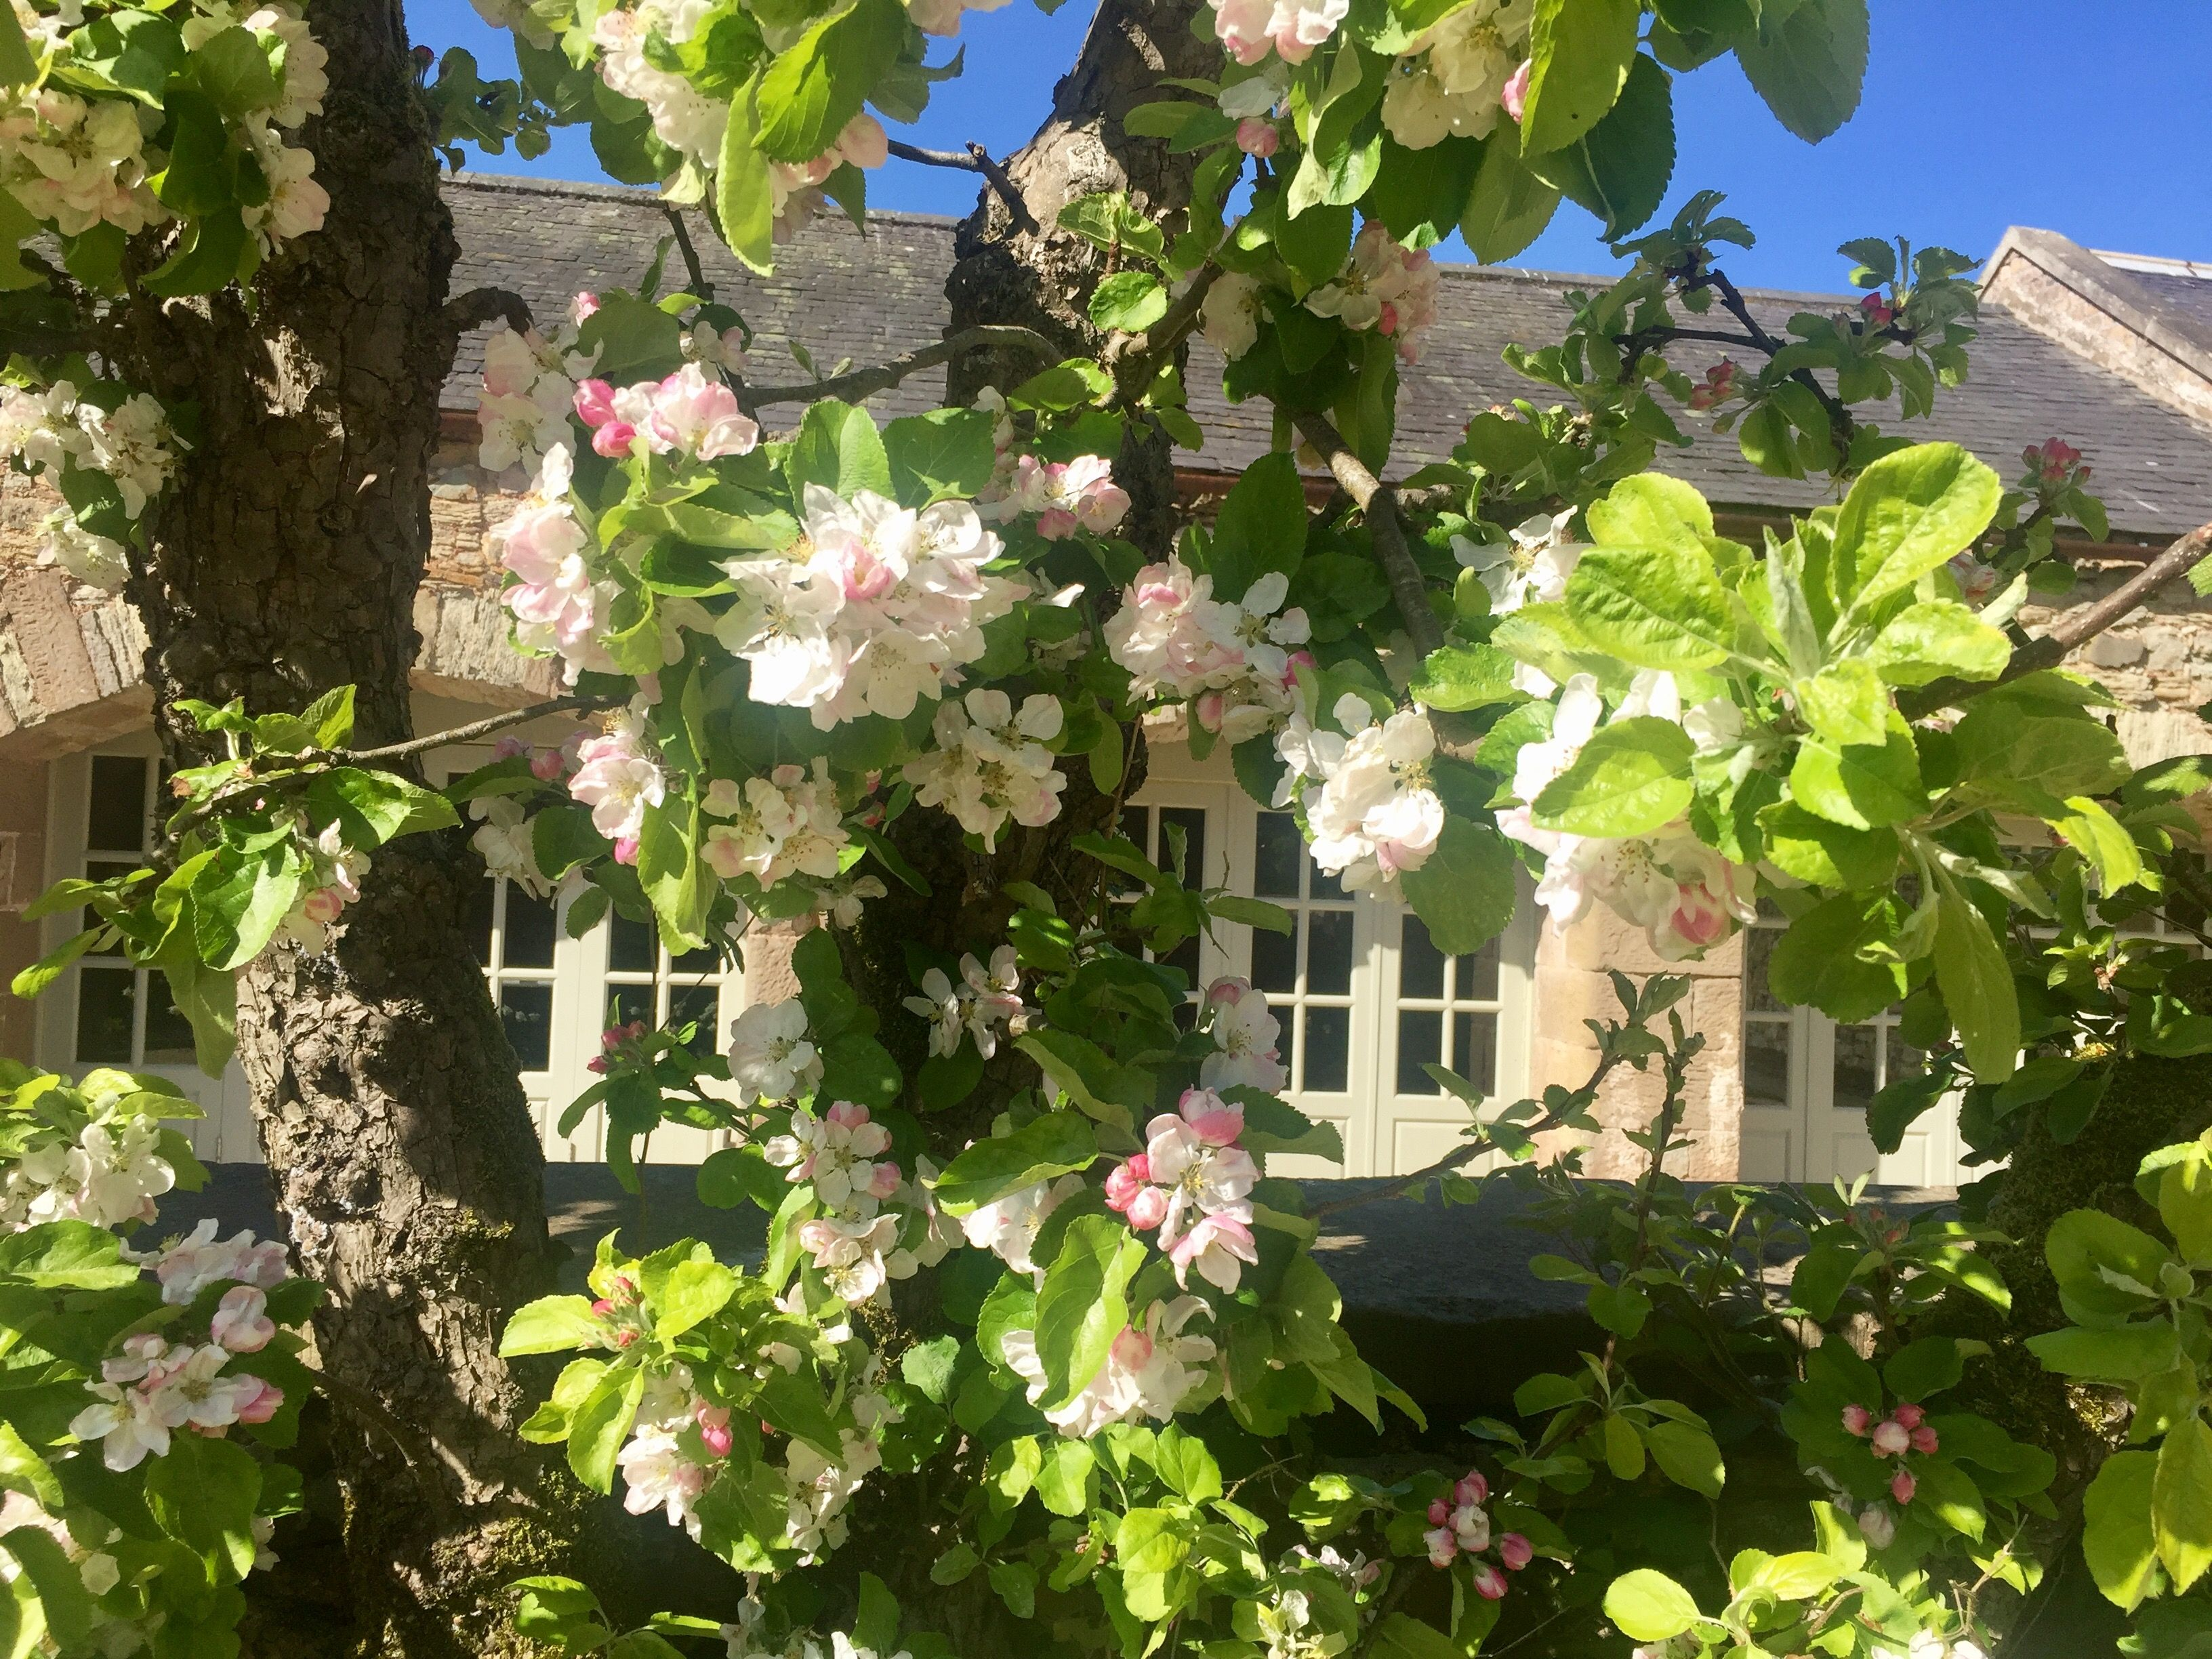 Apple blossom at the barns - Wedderburn Barns wedding ...